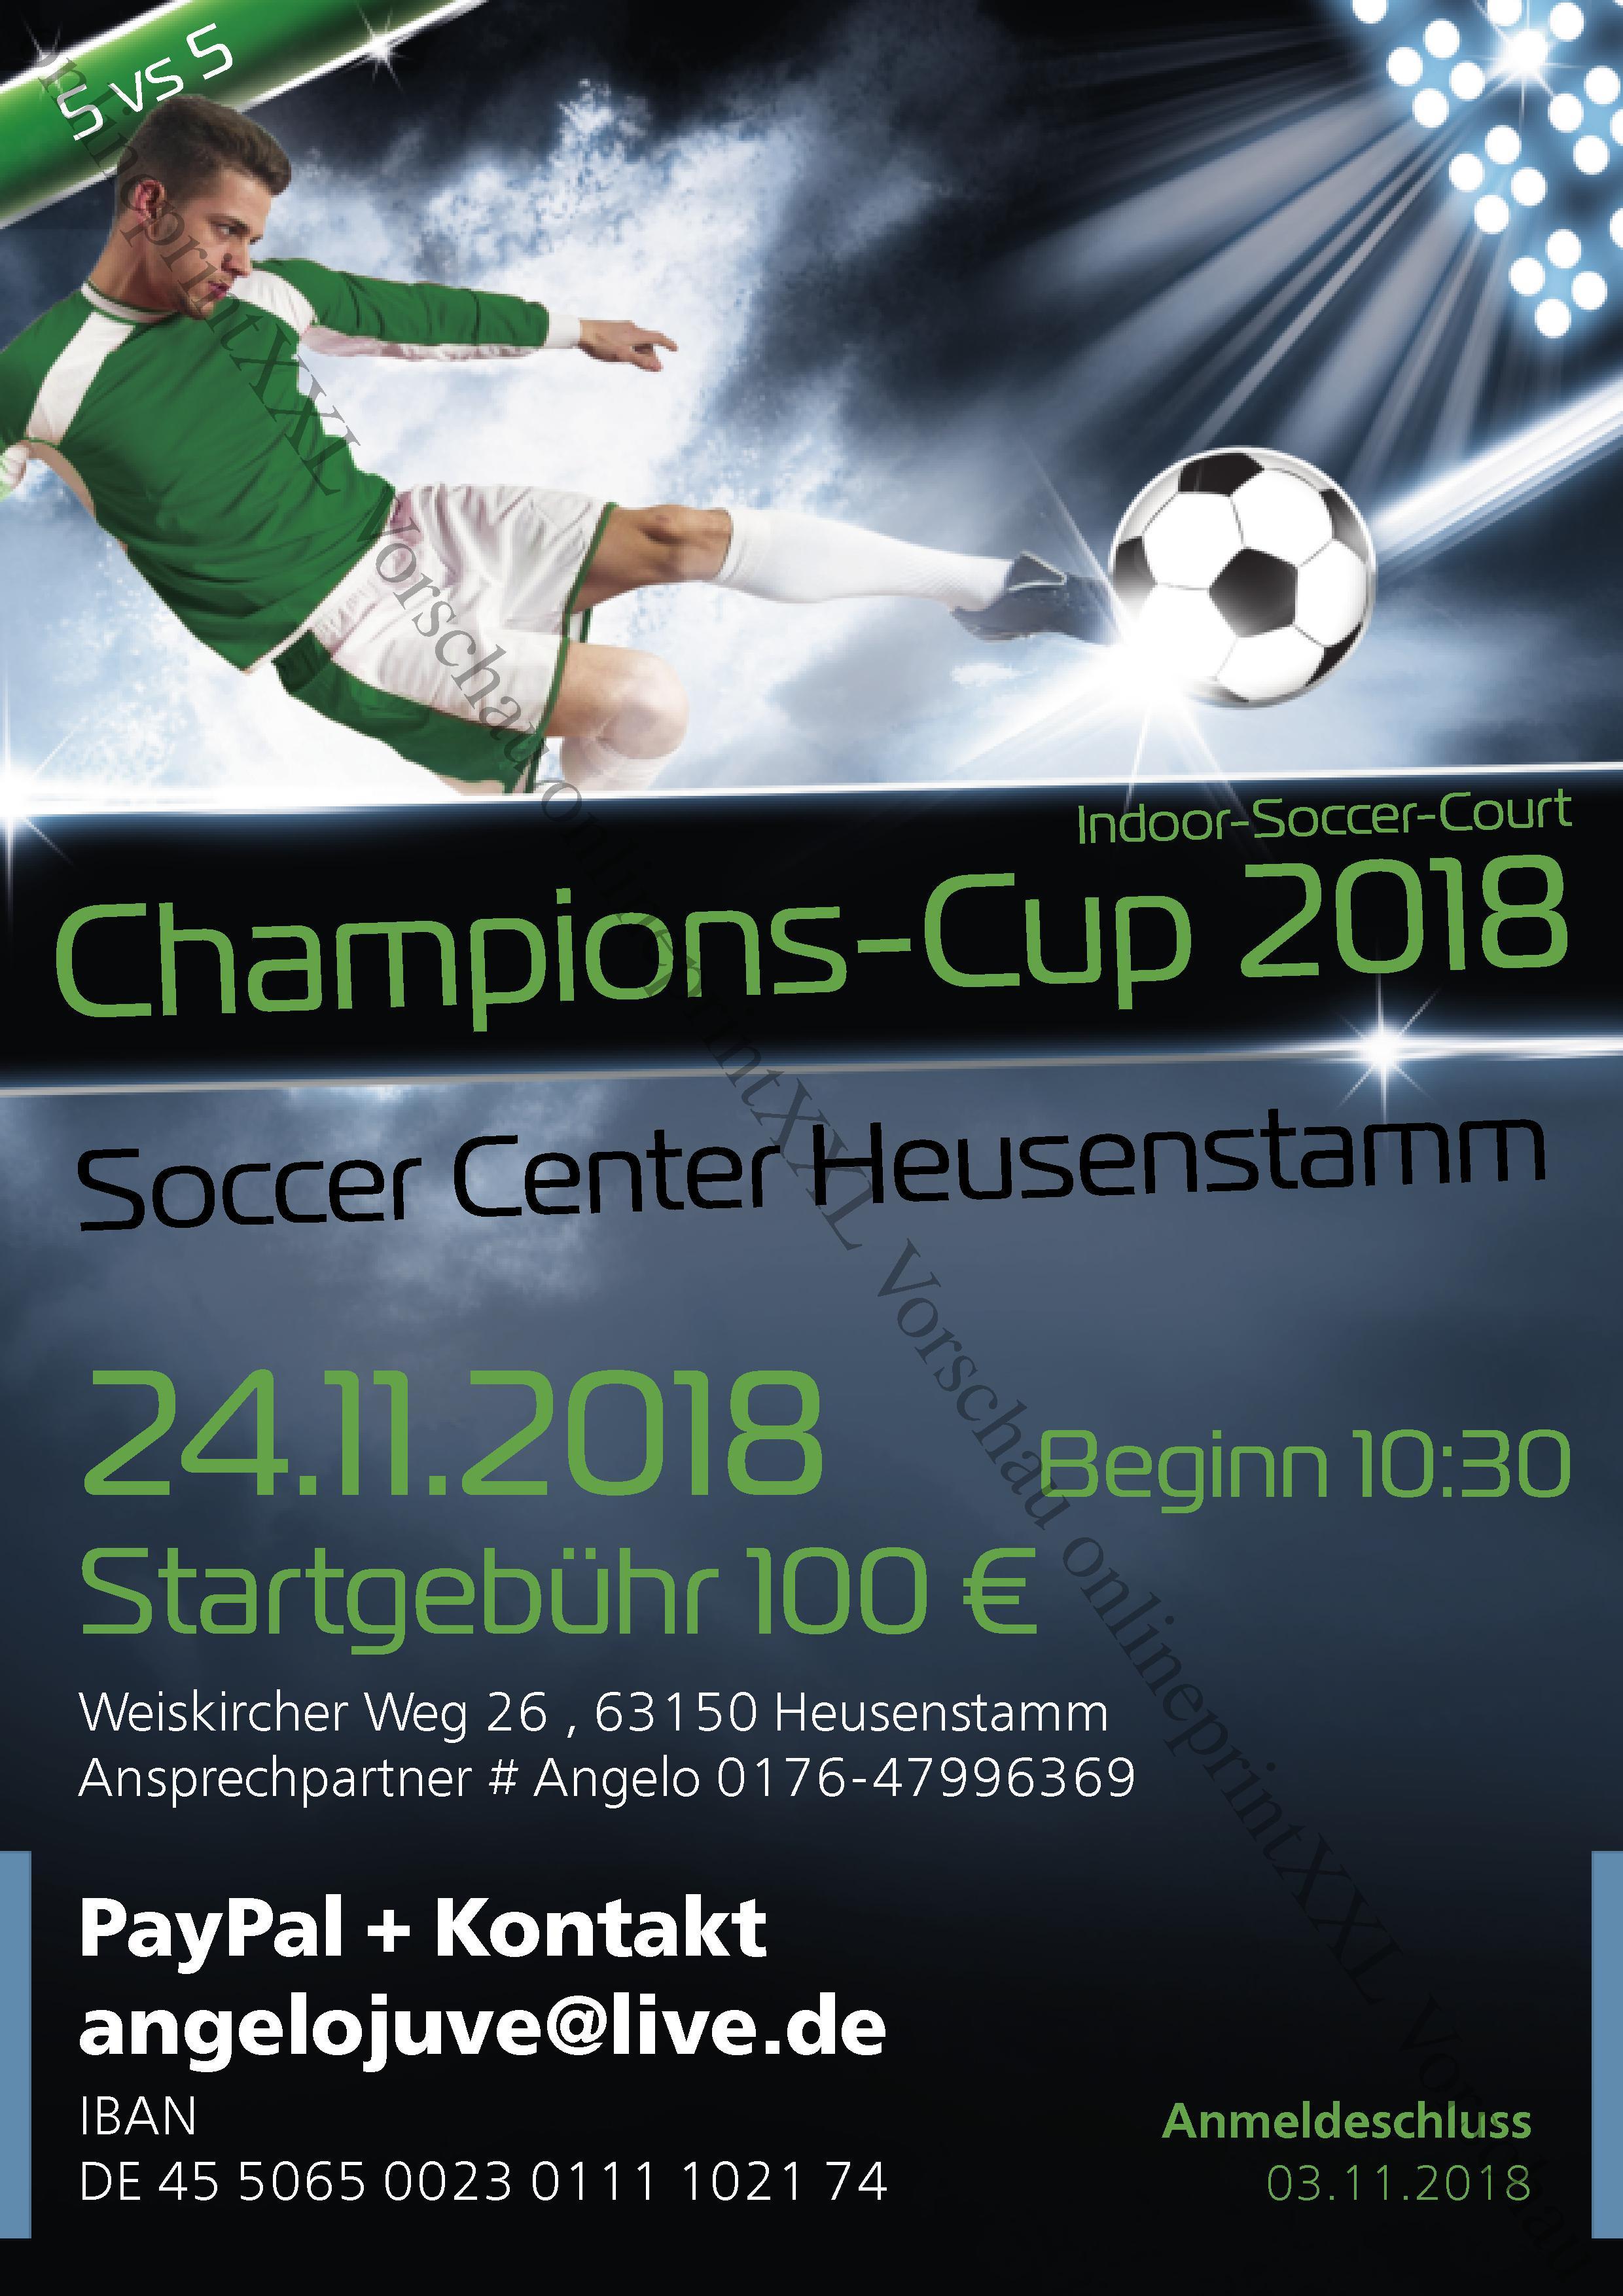 Champions Cup 63150 Heusenstamm Kleinfeldheldende